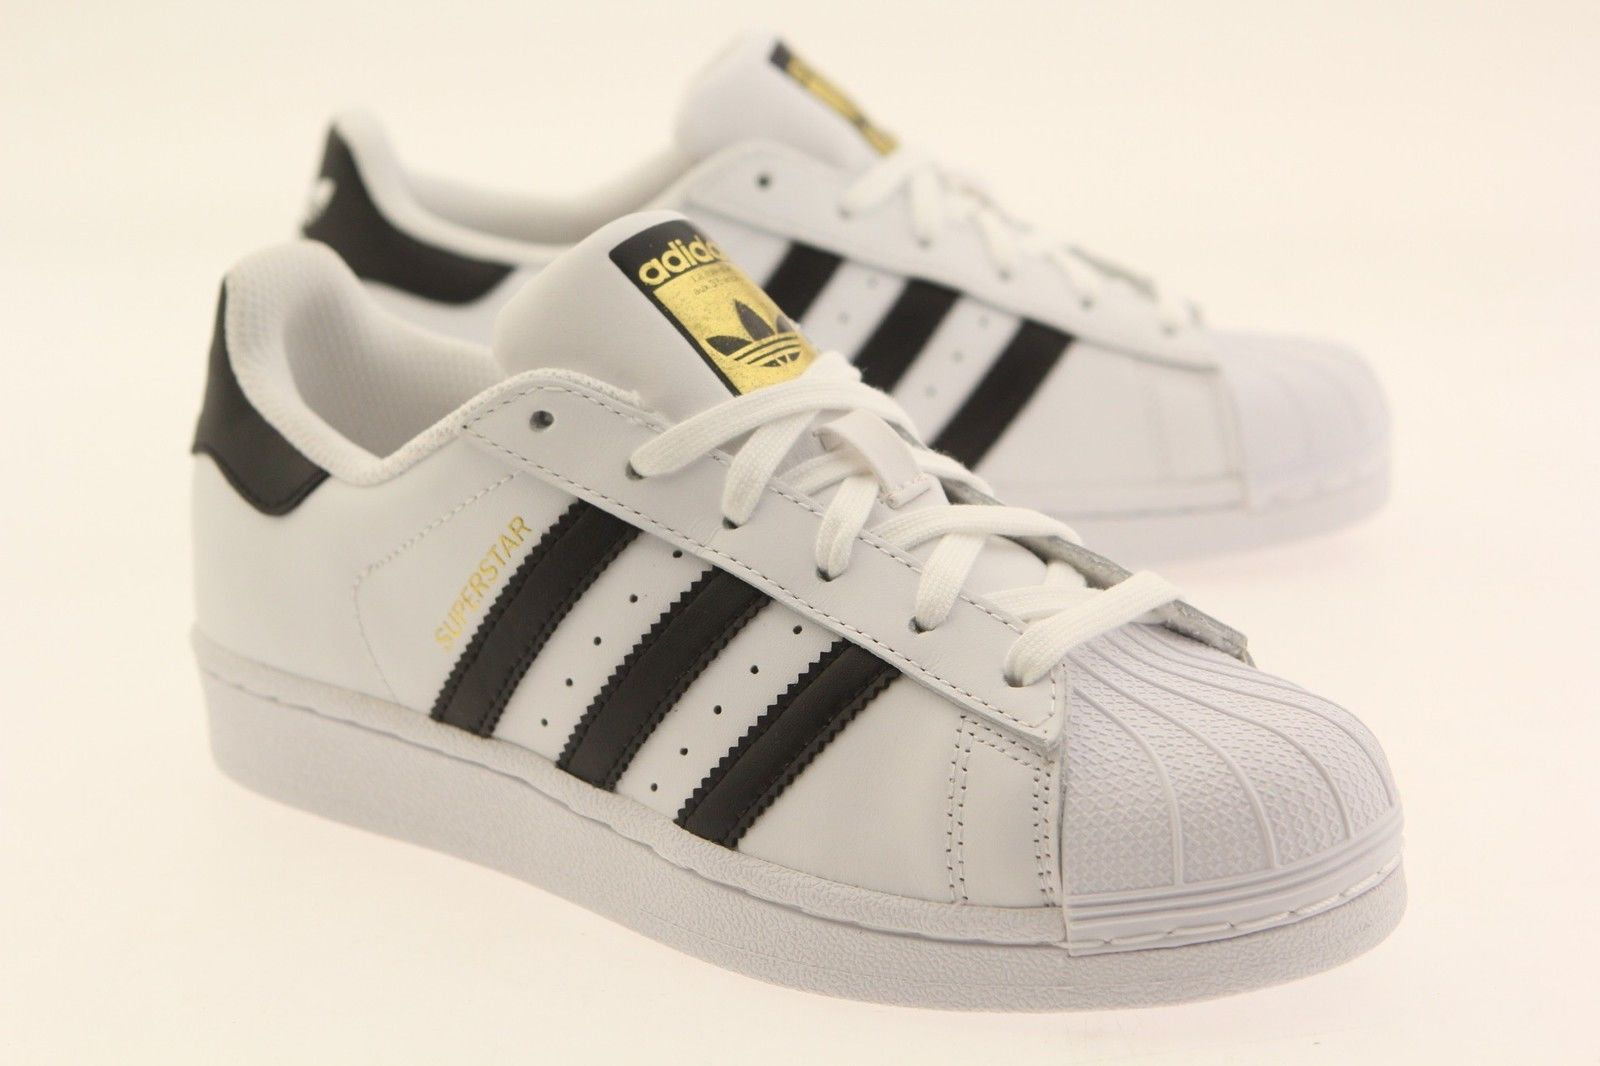 detailed look 75e43 db38d 62.99   Adidas Women Superstar white core black running ...